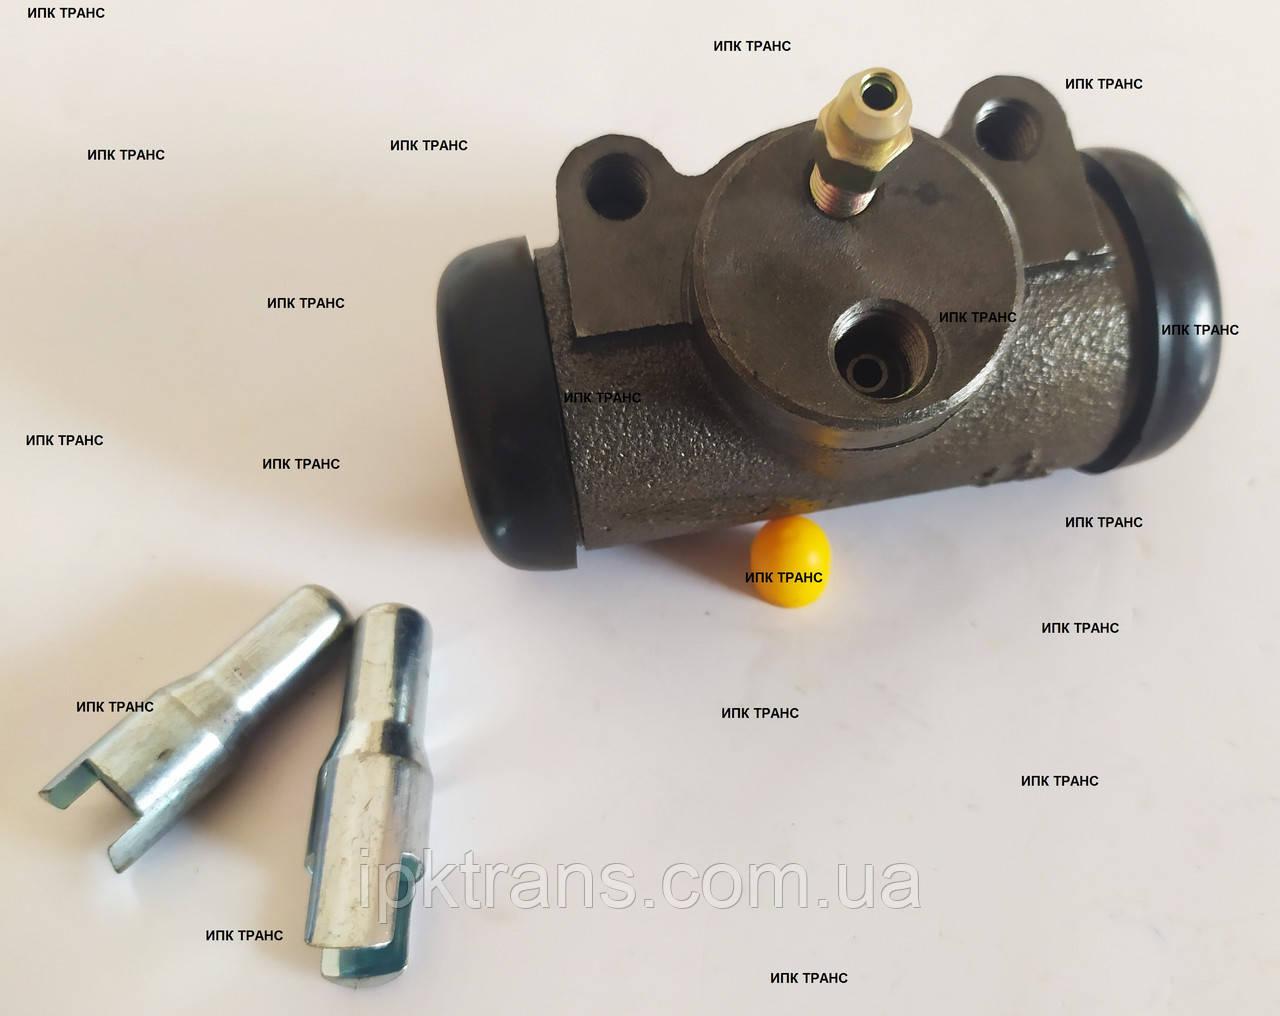 Тормозной цилиндр погрузчика TCM FD30T3/C3/T4/C4/W3, FG30T3/C3/T4/C4/W3   C-52-13117-52000 / C521311752000